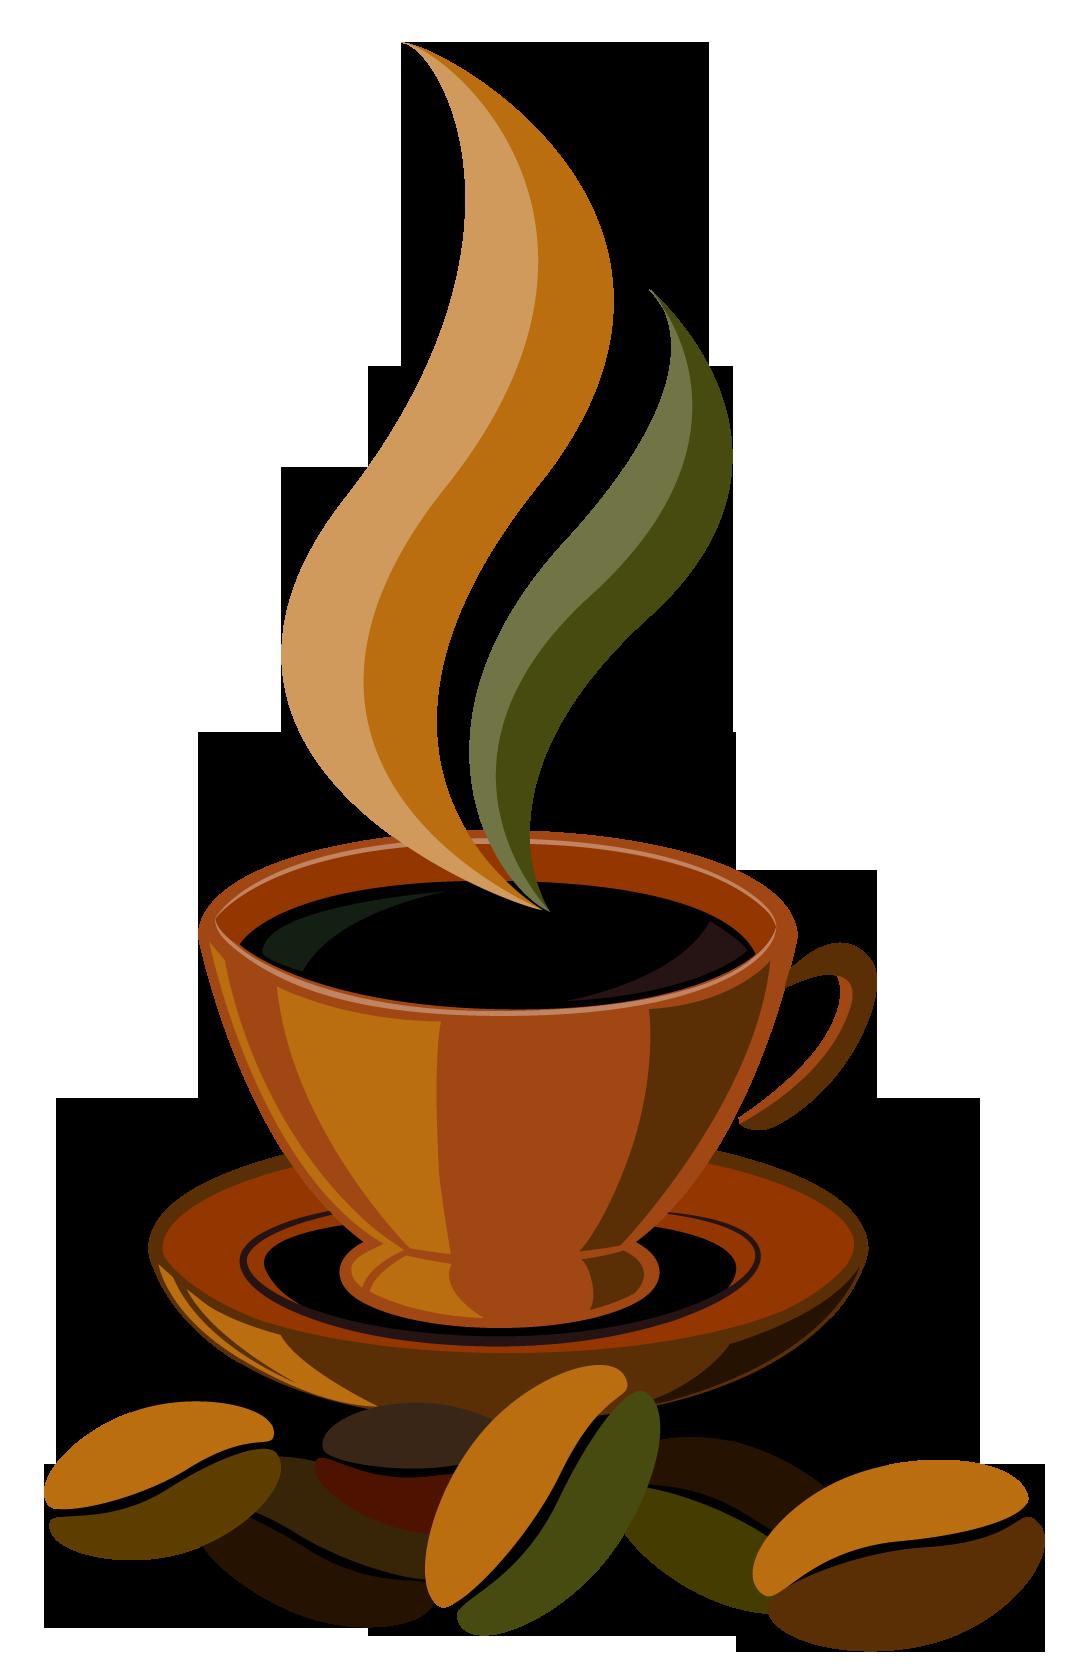 coffee creamer clipart - photo #11